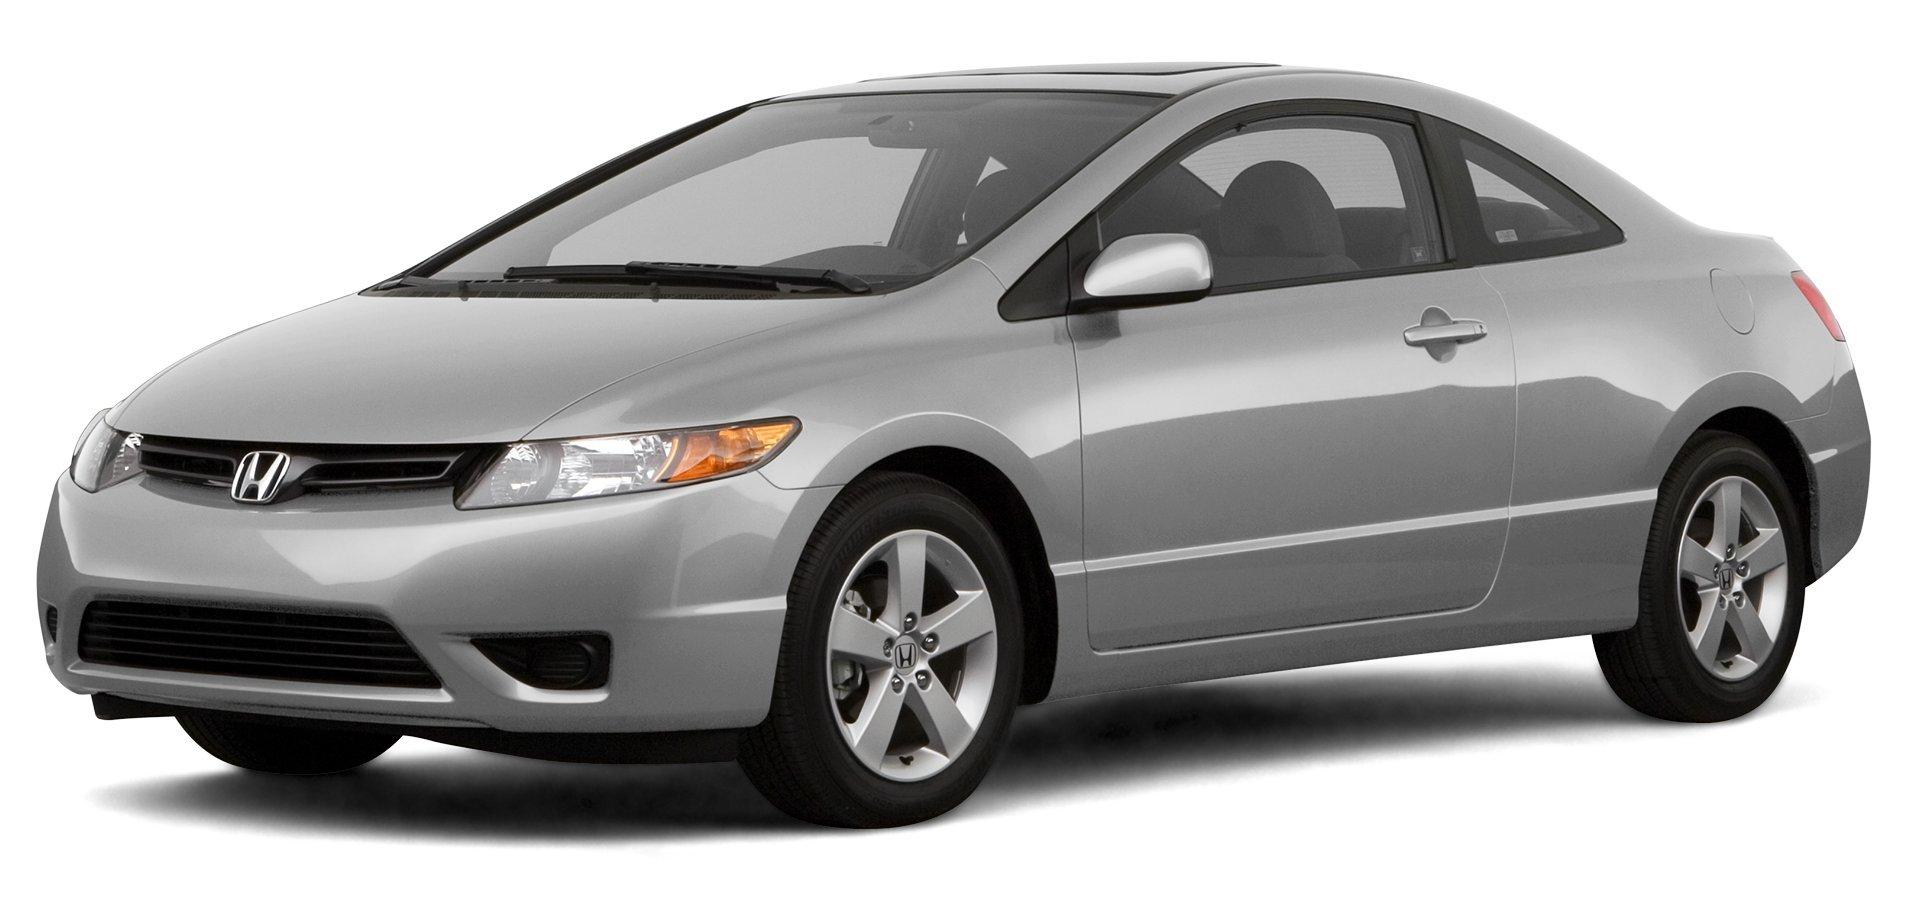 ... 2007 Honda Civic EX, 2-Door Manual Transmission w/Navigation ...